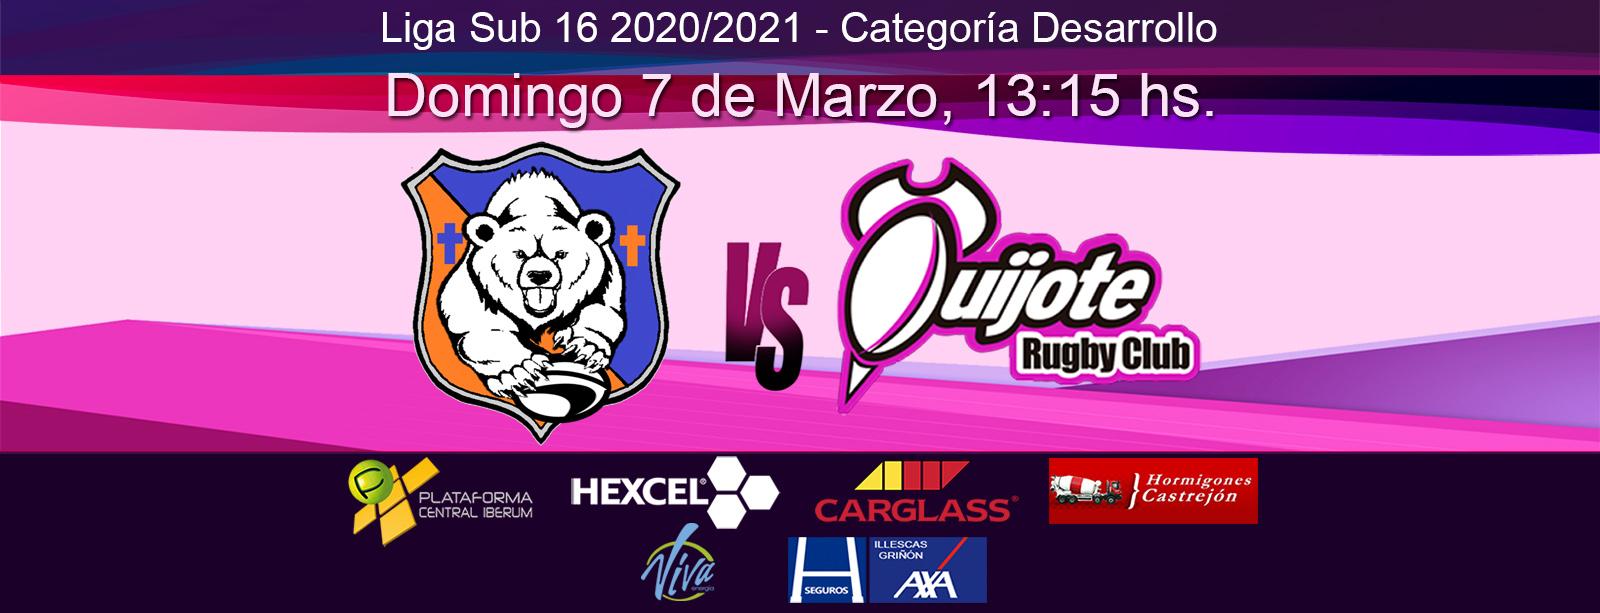 Sub16: Osos del Pardo vs Quijote RC (07/03/2021)